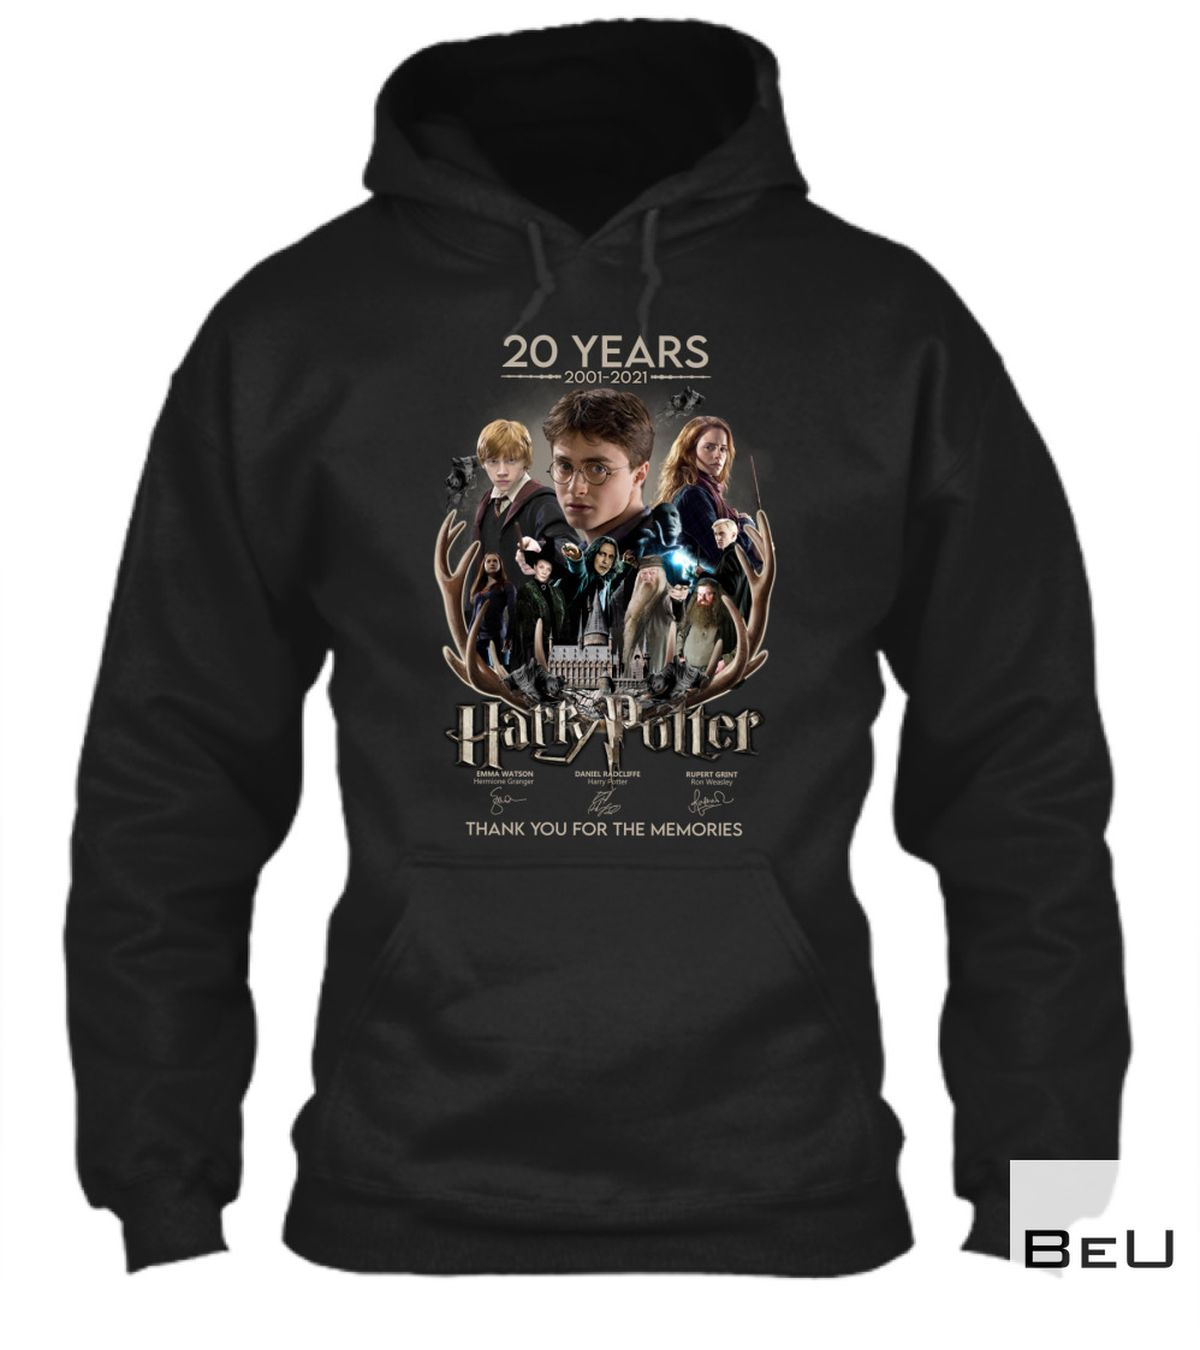 Funny Tee Harry Potter 20th-anniversary Shirt, hoodie, tank top